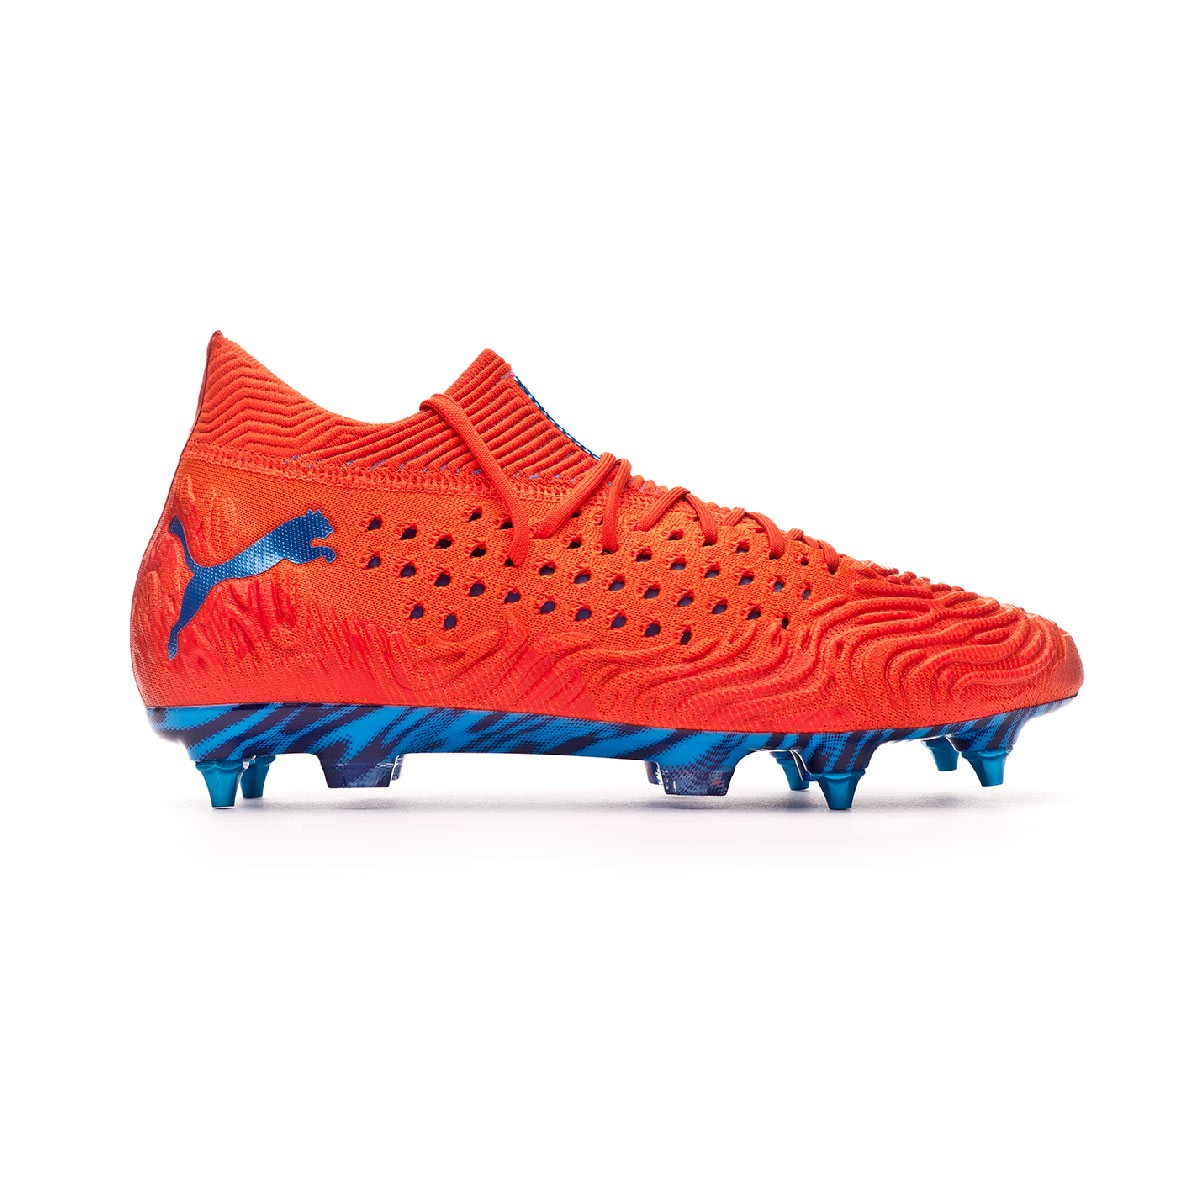 Football Boots Puma Future 19.1 Netfit